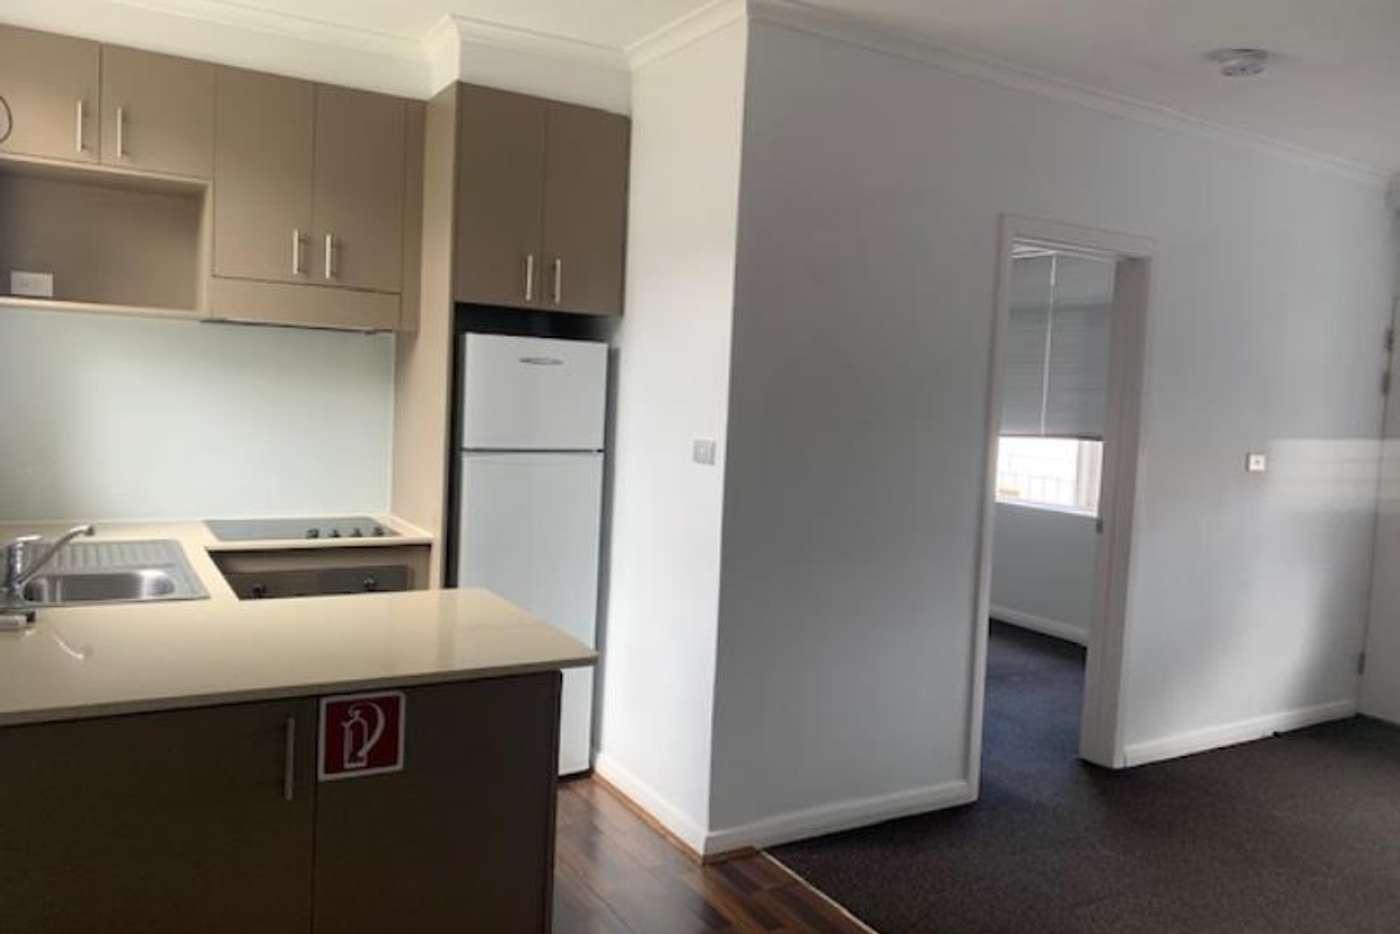 Main view of Homely unit listing, 10/7 Raglan Street, St Kilda East VIC 3183